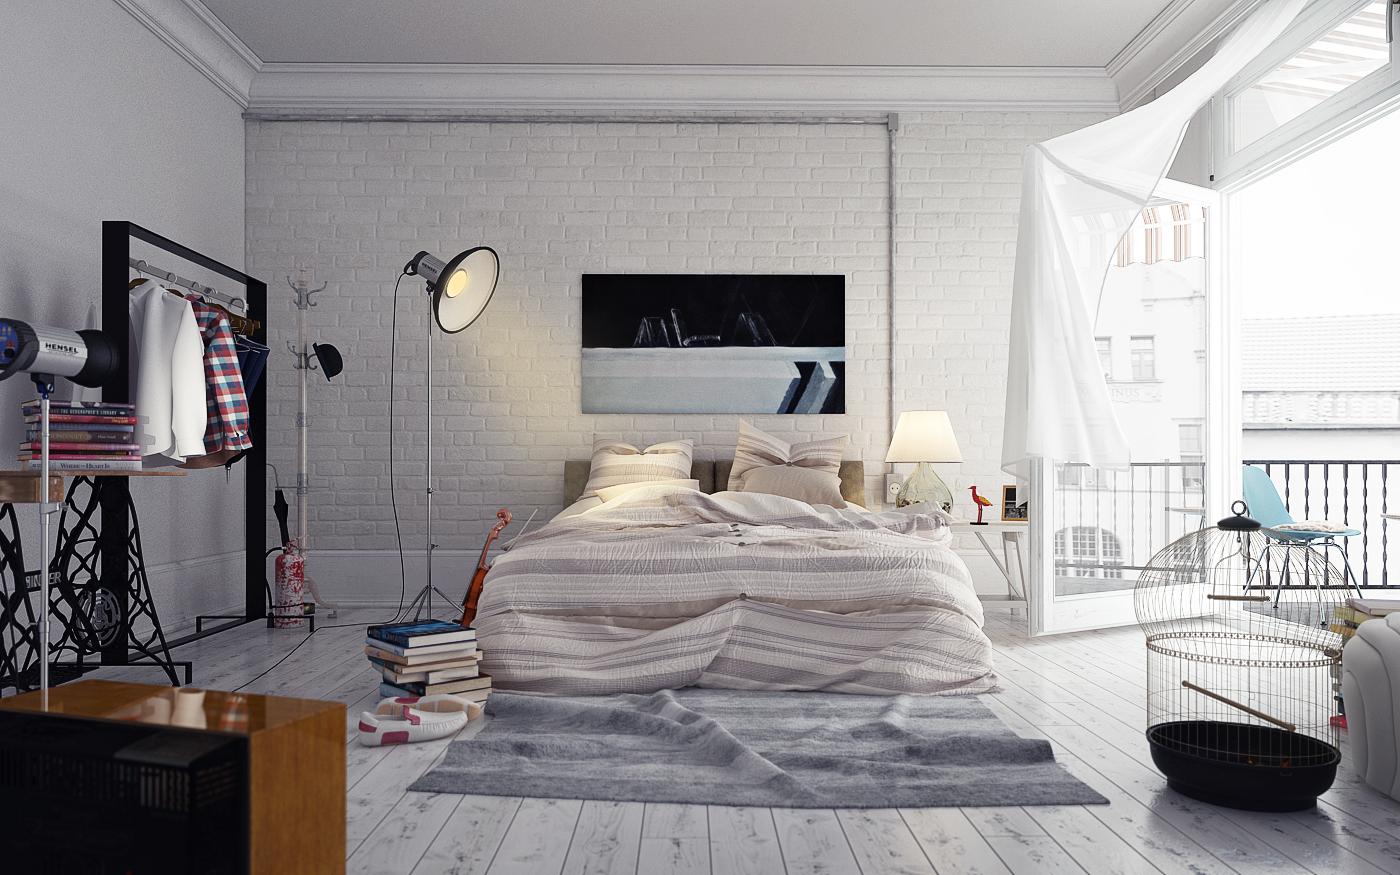 interior bedroom.02 by pitposum